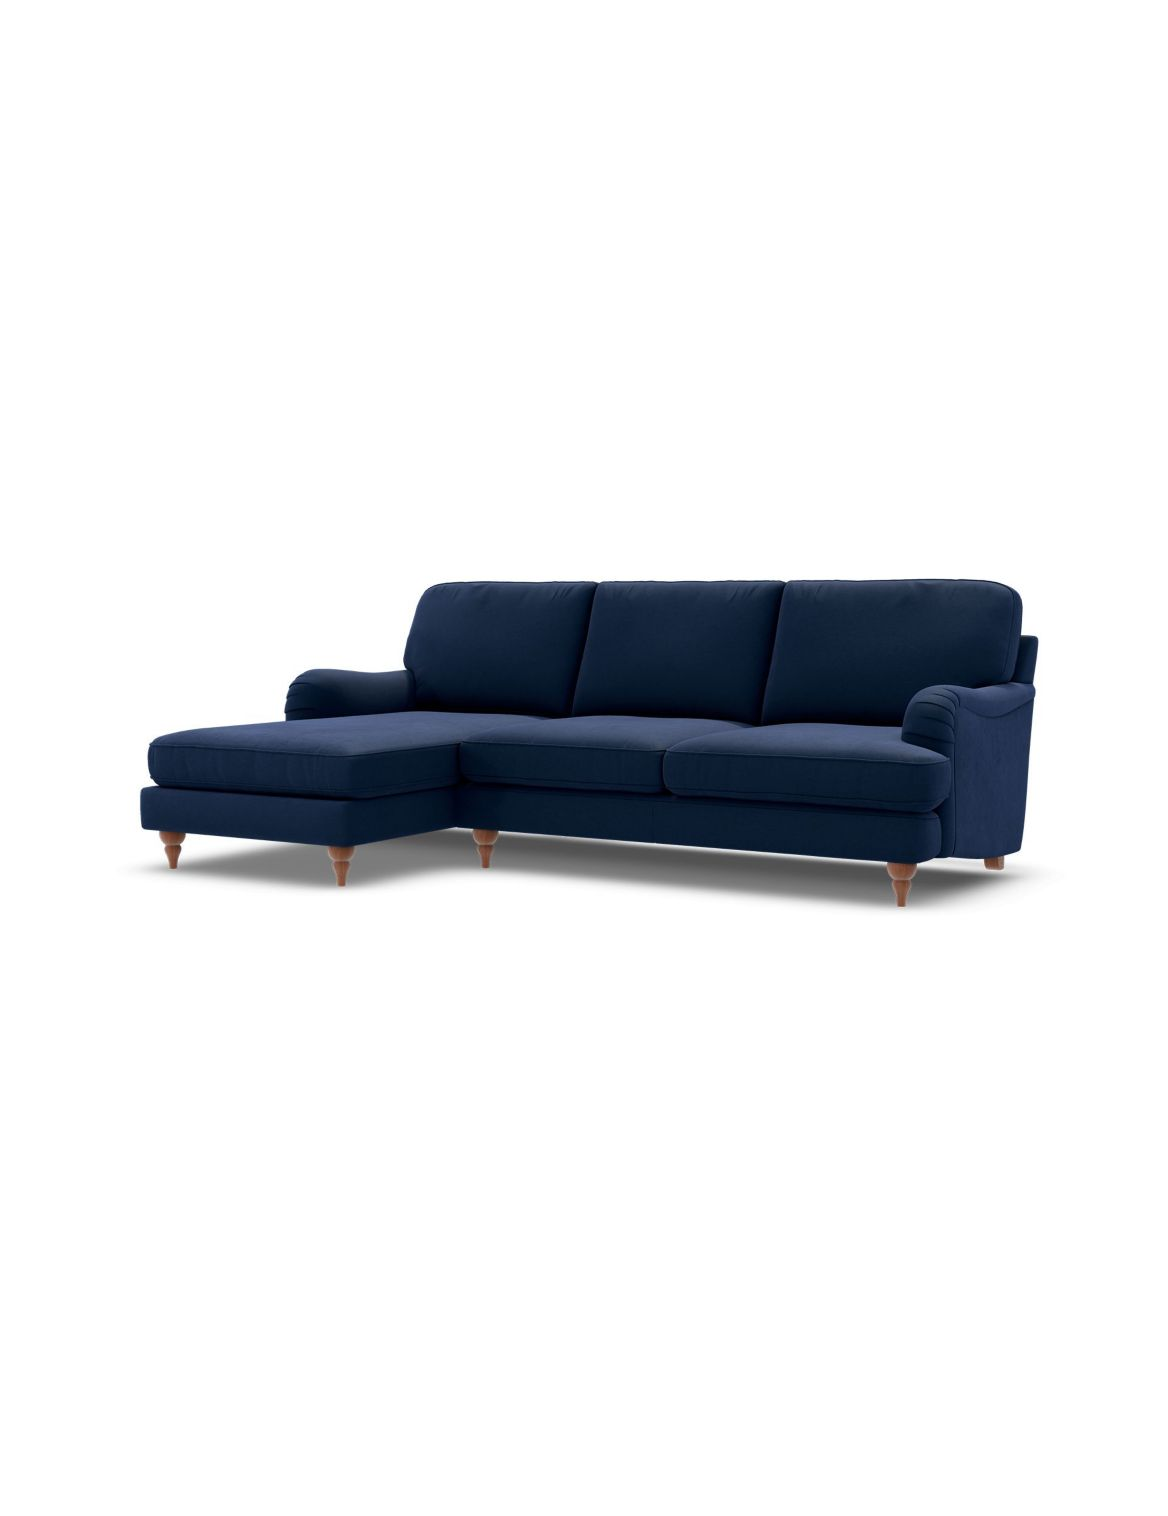 Rochester Corner Chaise Sofa (Left-Hand) Navy